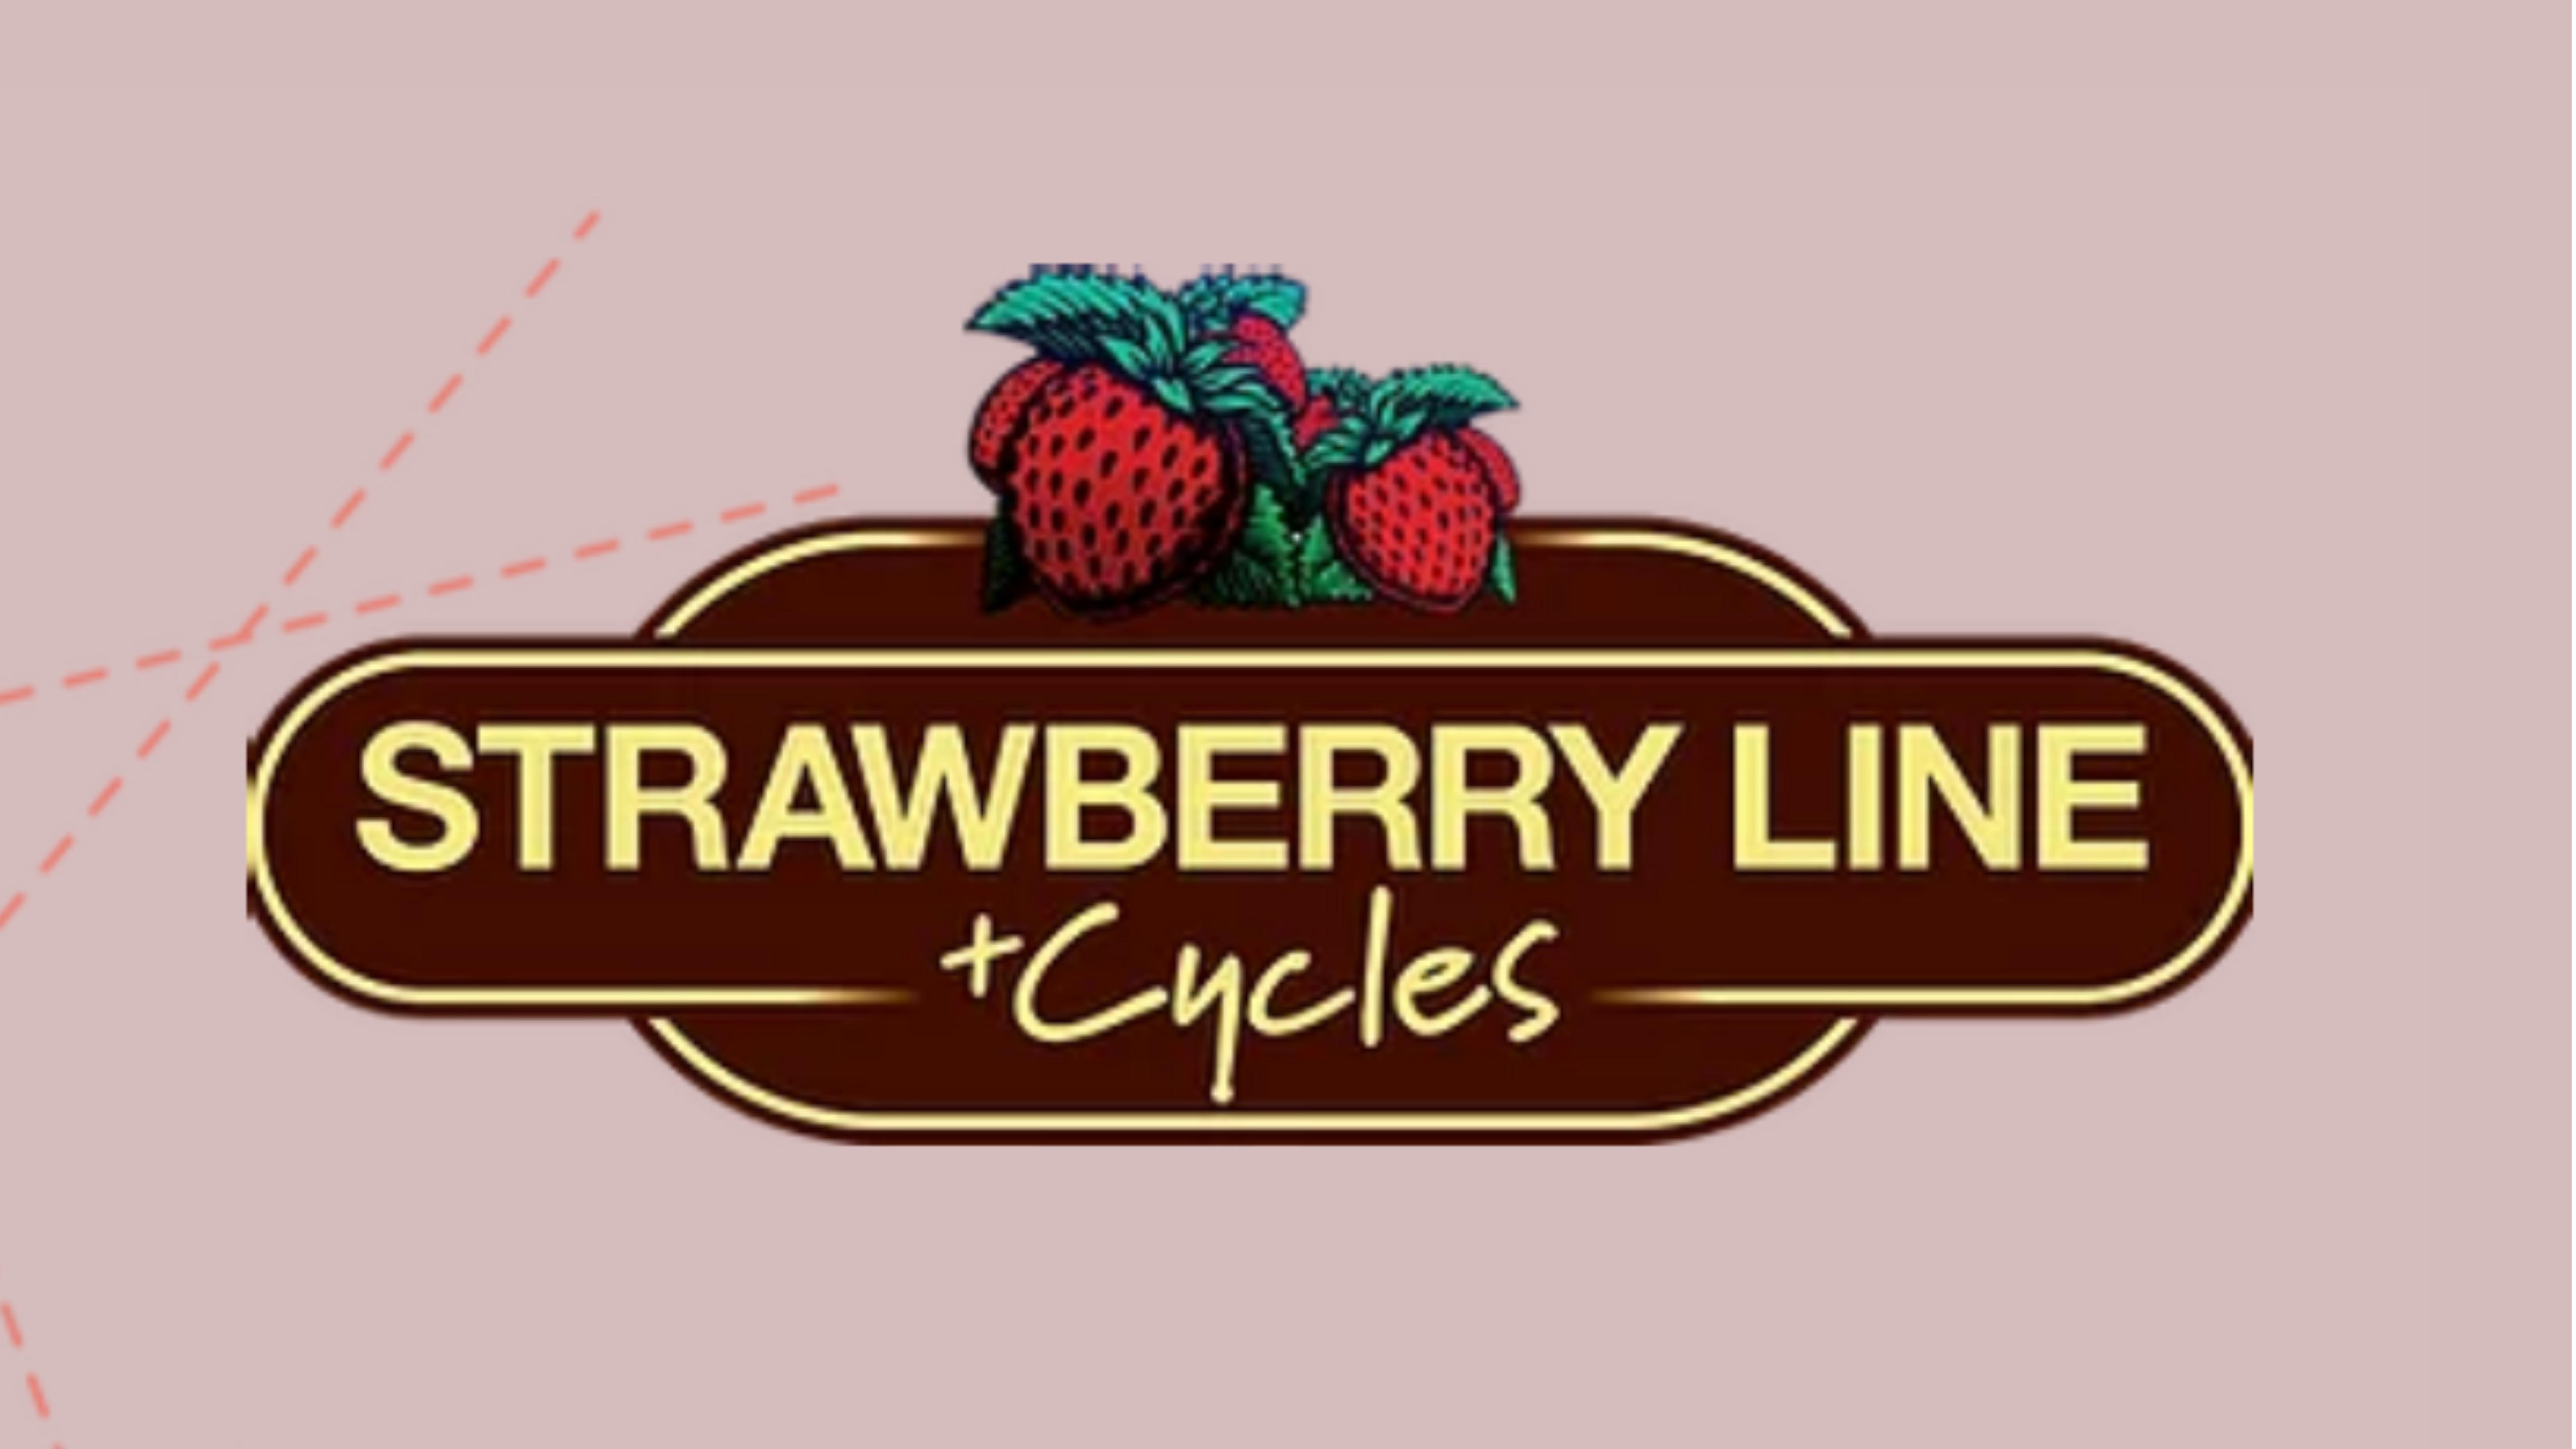 Strawberry Line Cycles logo